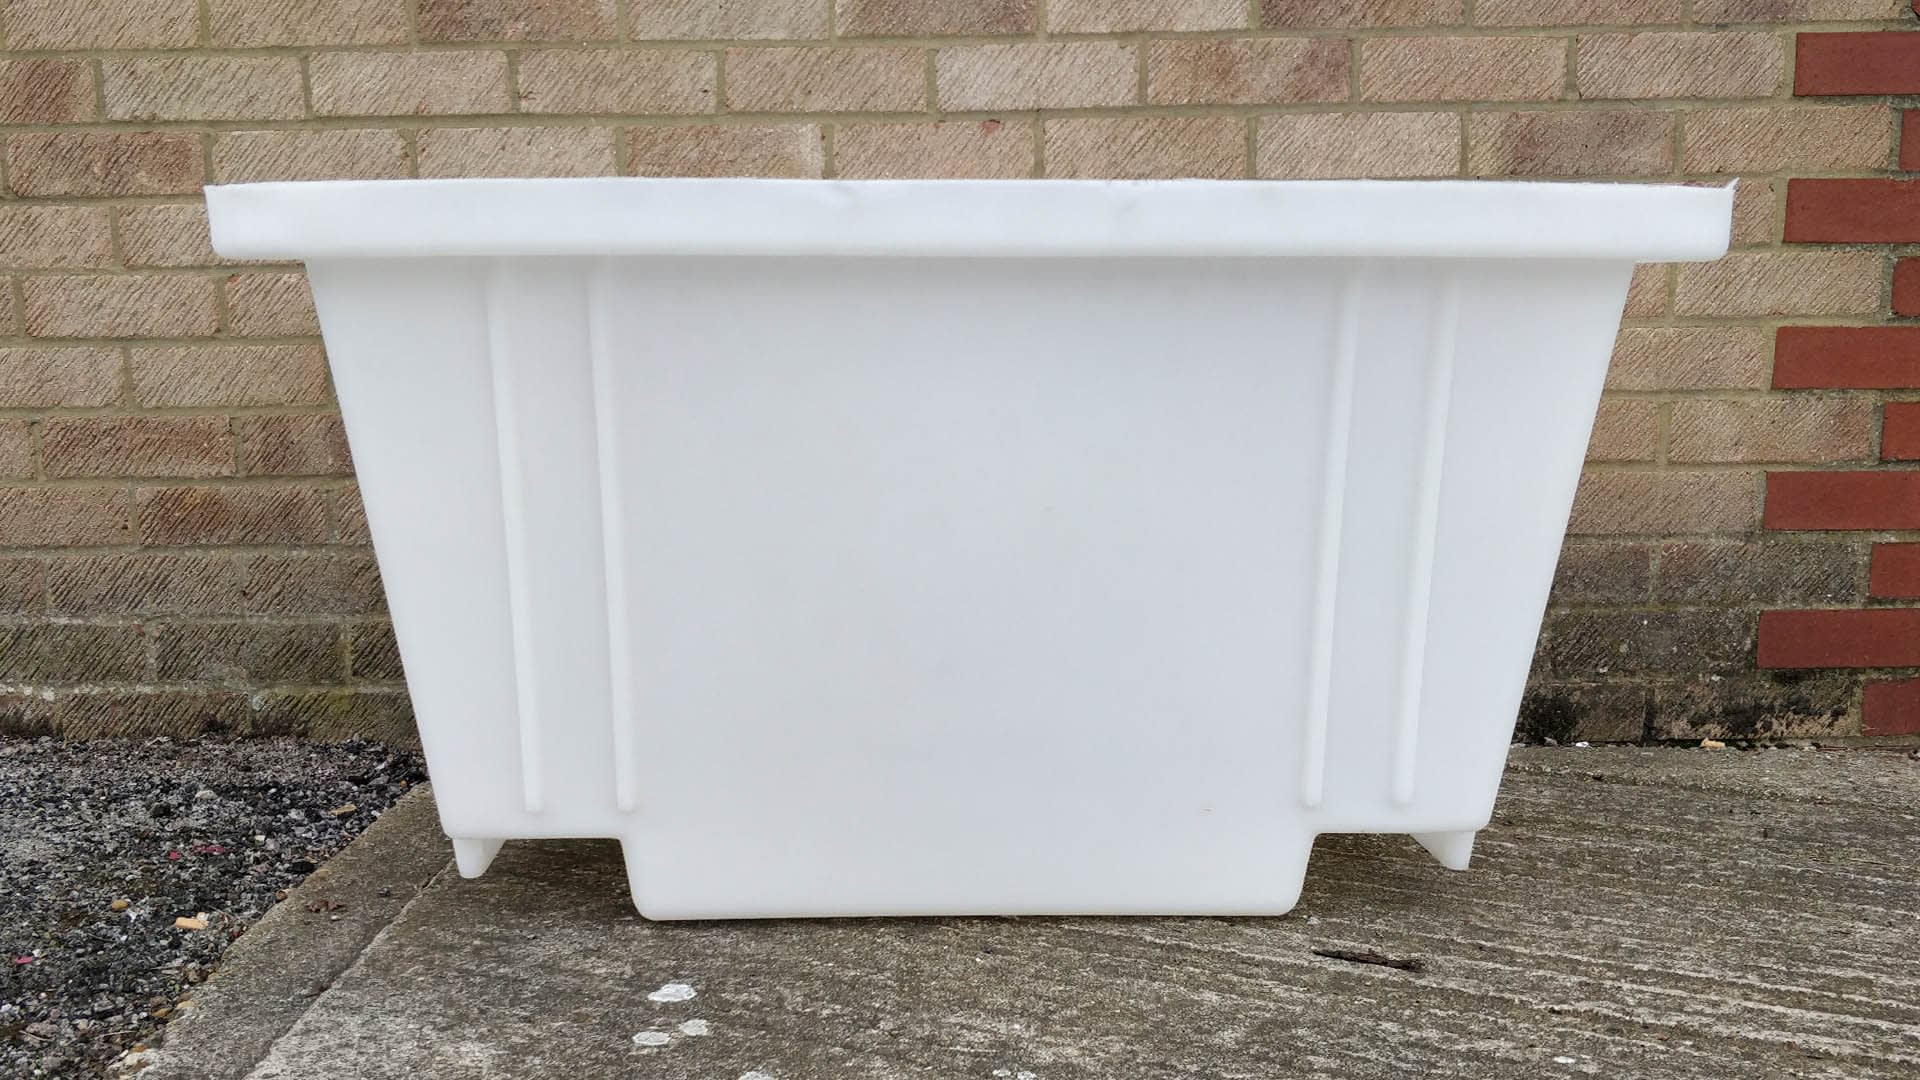 mortar tub side length building materials